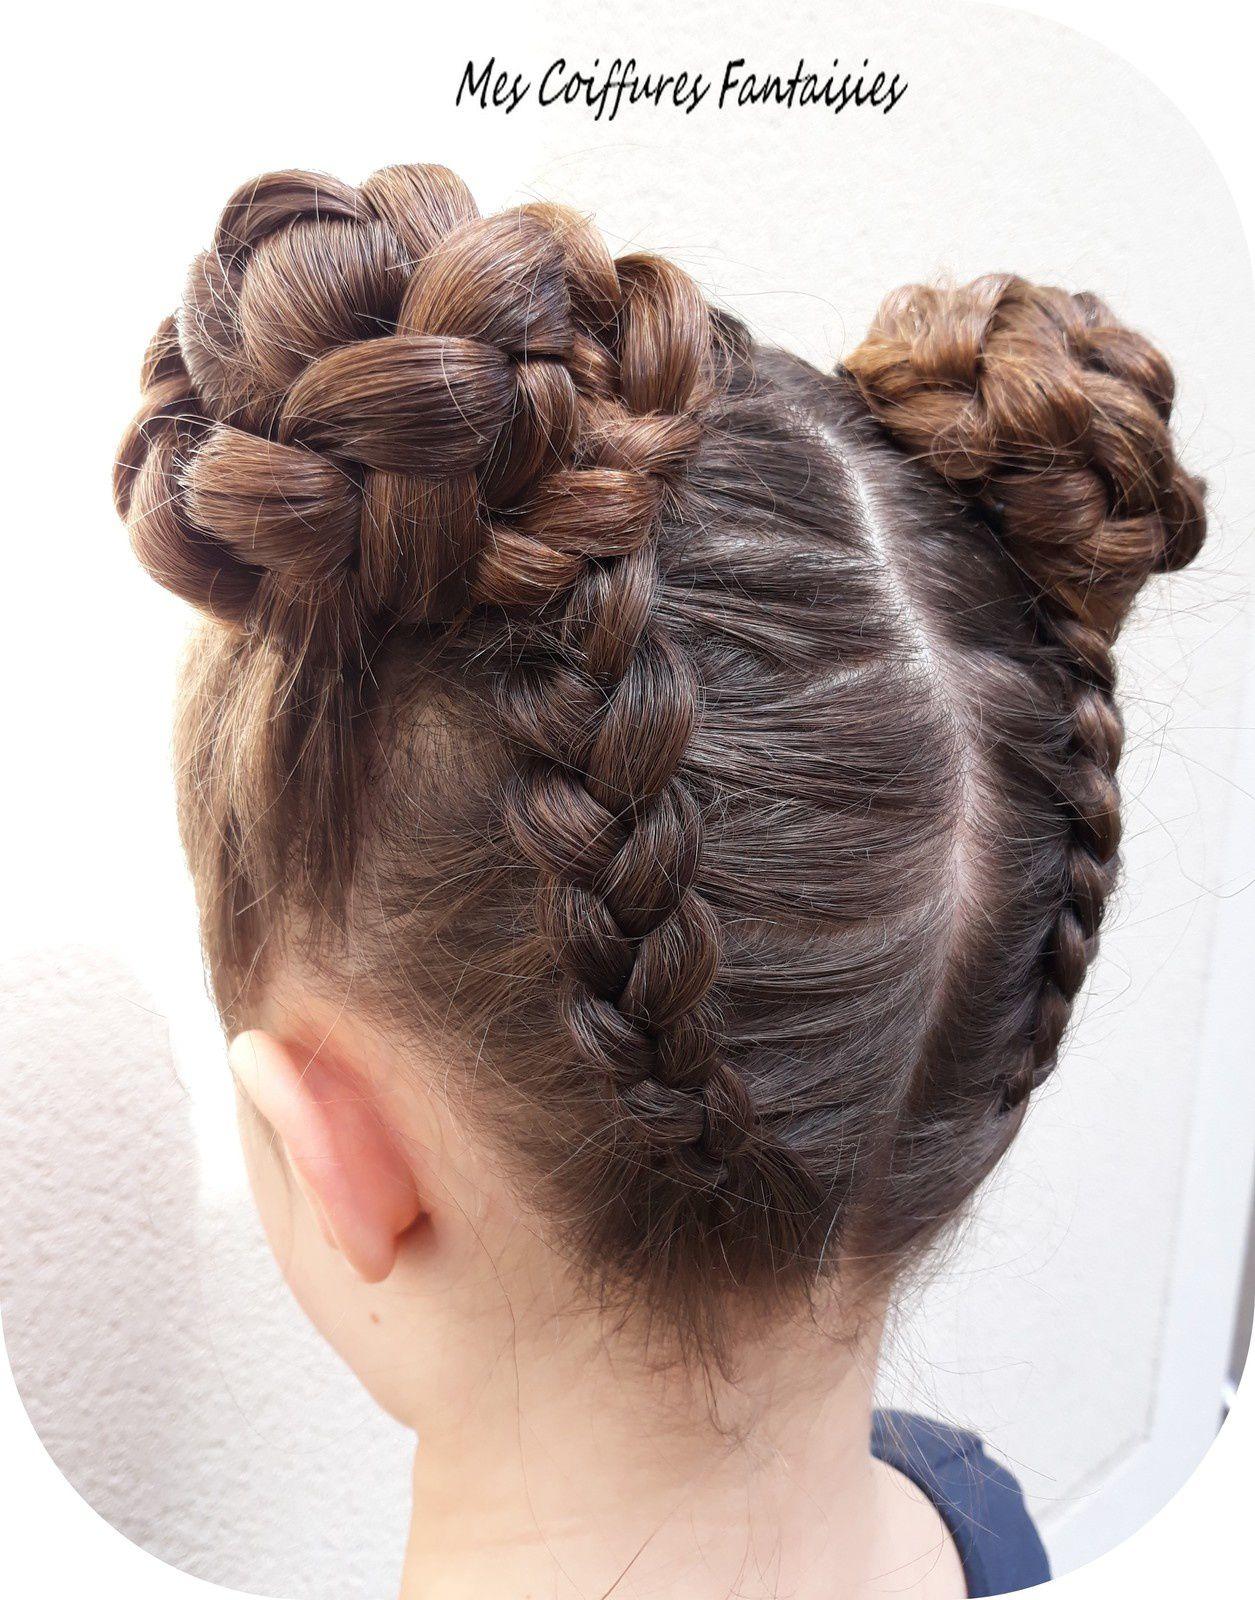 Coiffure Petite Fille 2 Chignons | Coiffures Cheveux Longs